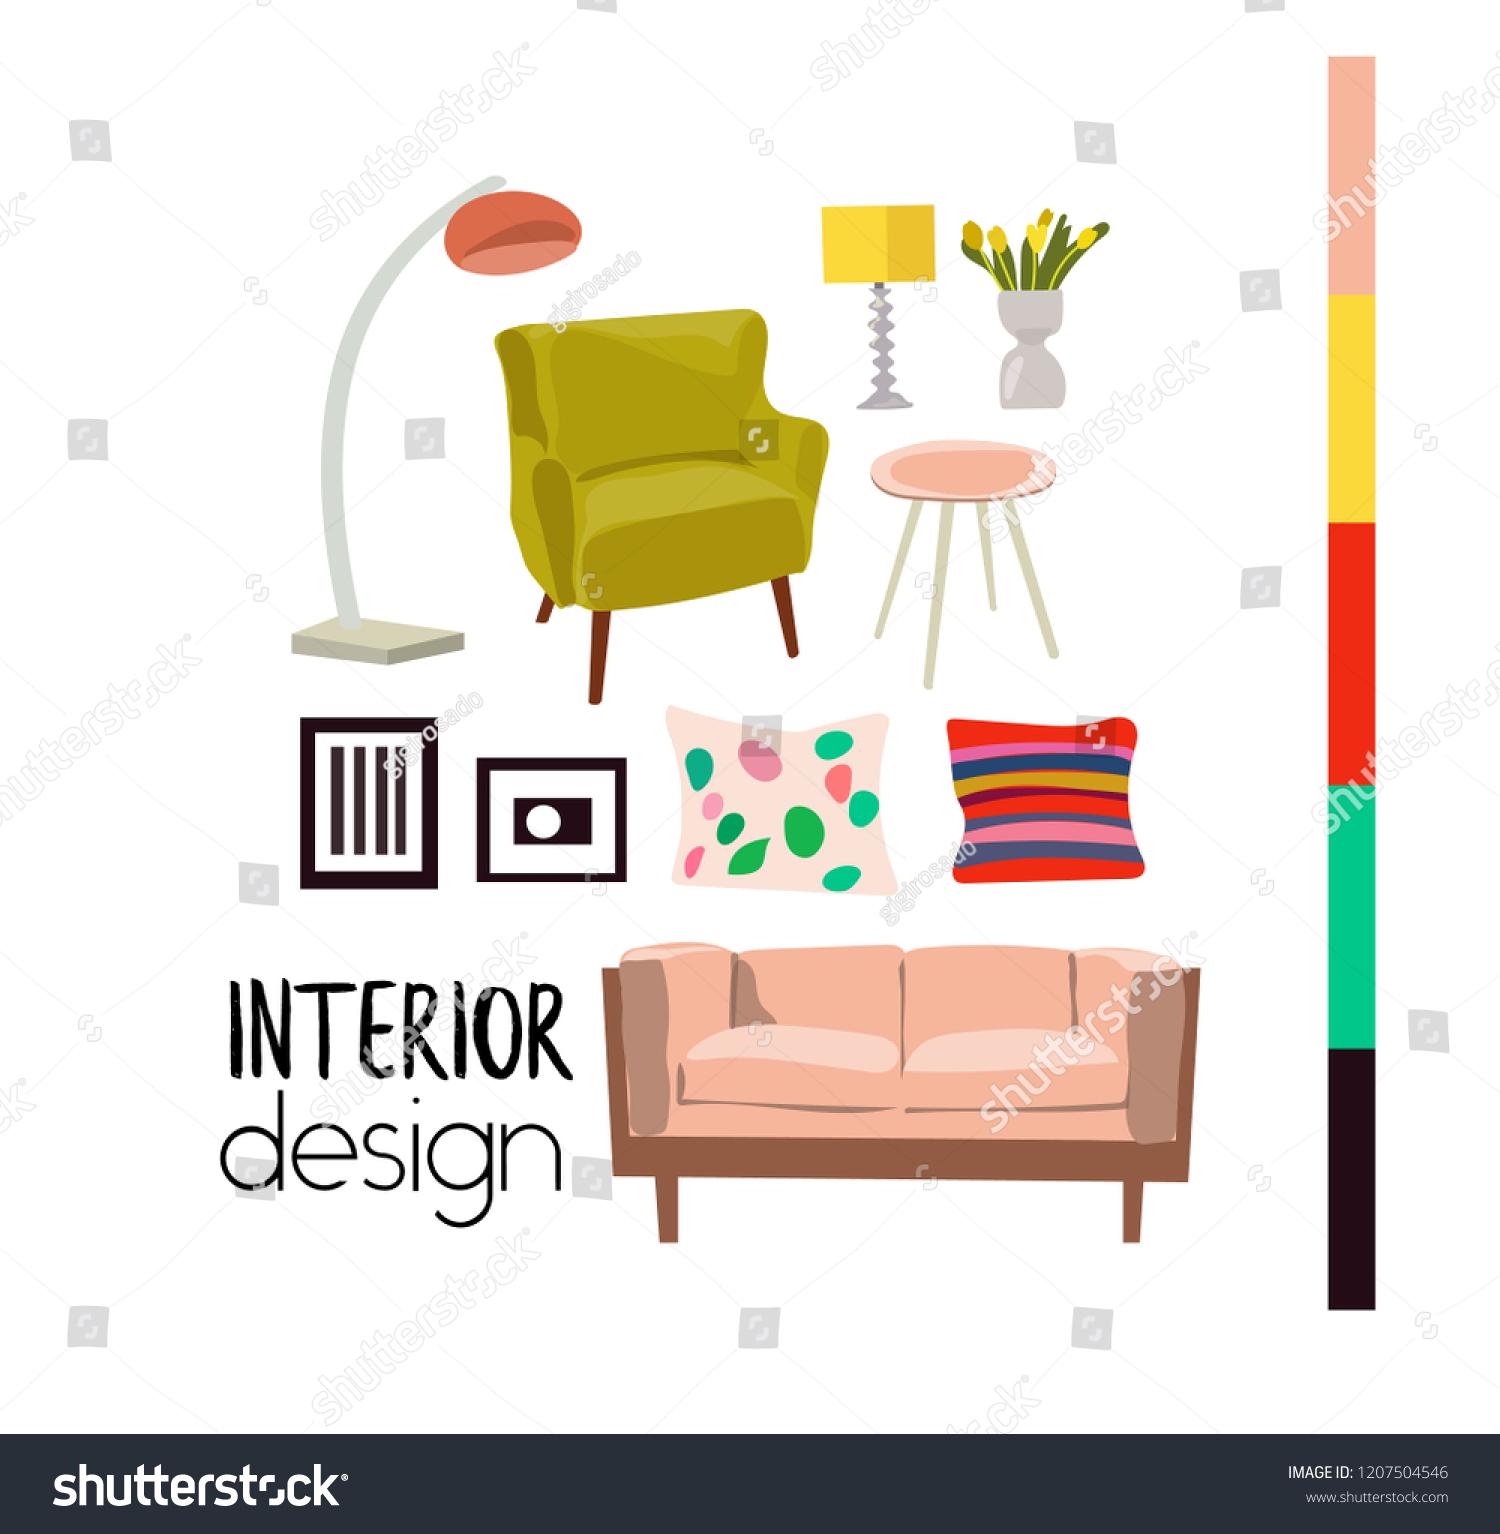 Vector interior design elements modern furniture living room sofa armchair mood board mid century modern style furniture mood board vector